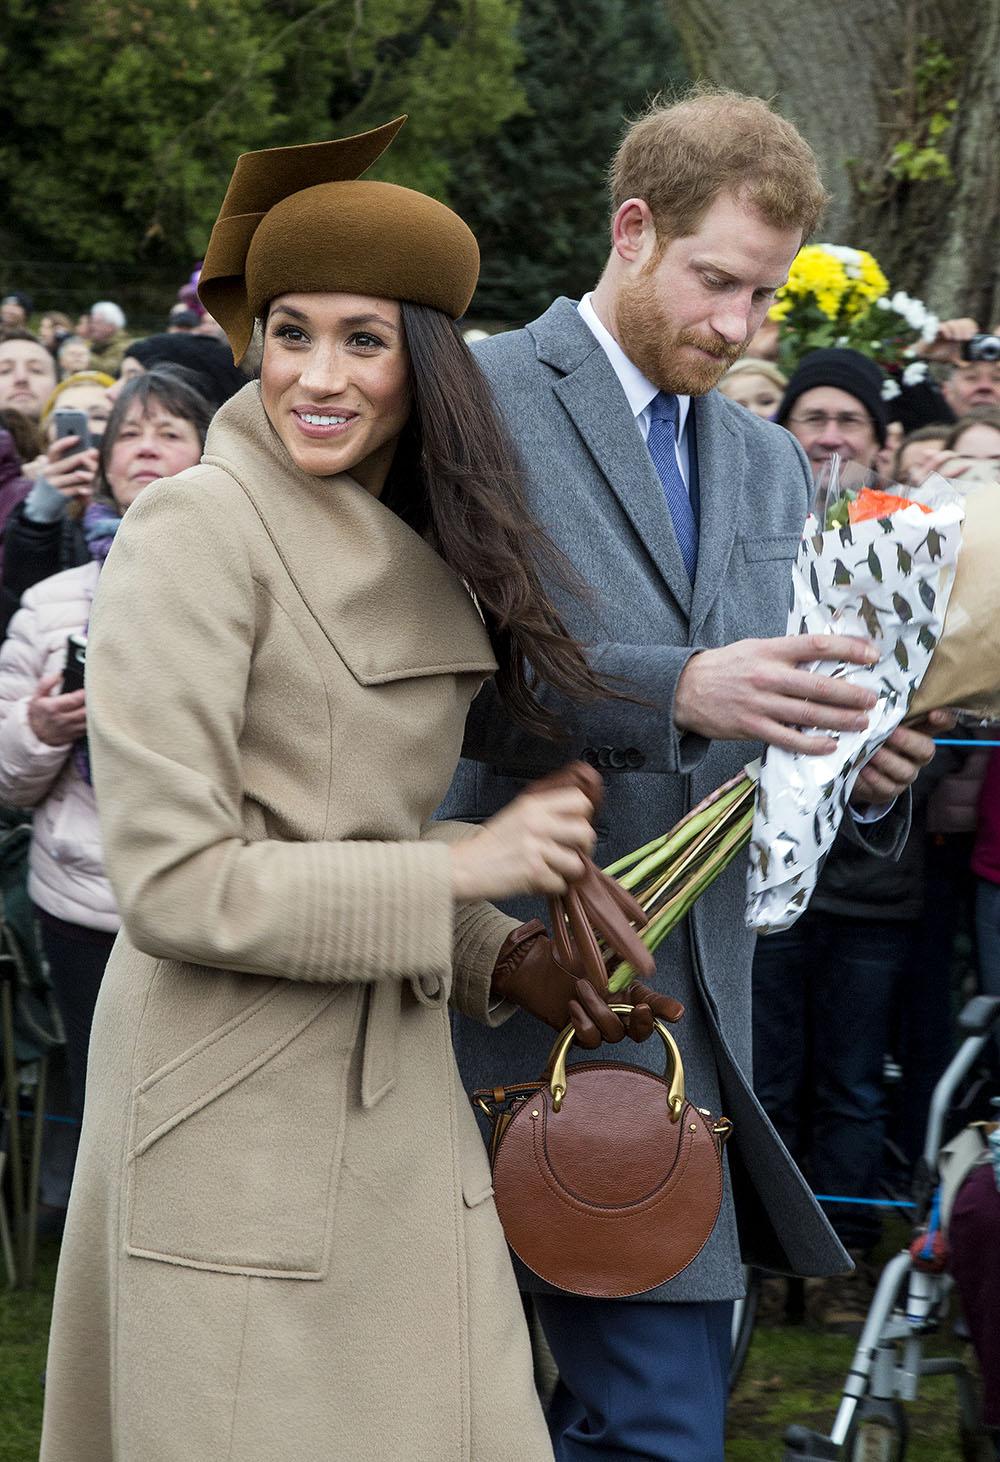 Prince Harry & Meghan Markle joins the Royal family at Sandringham on Christmas Day